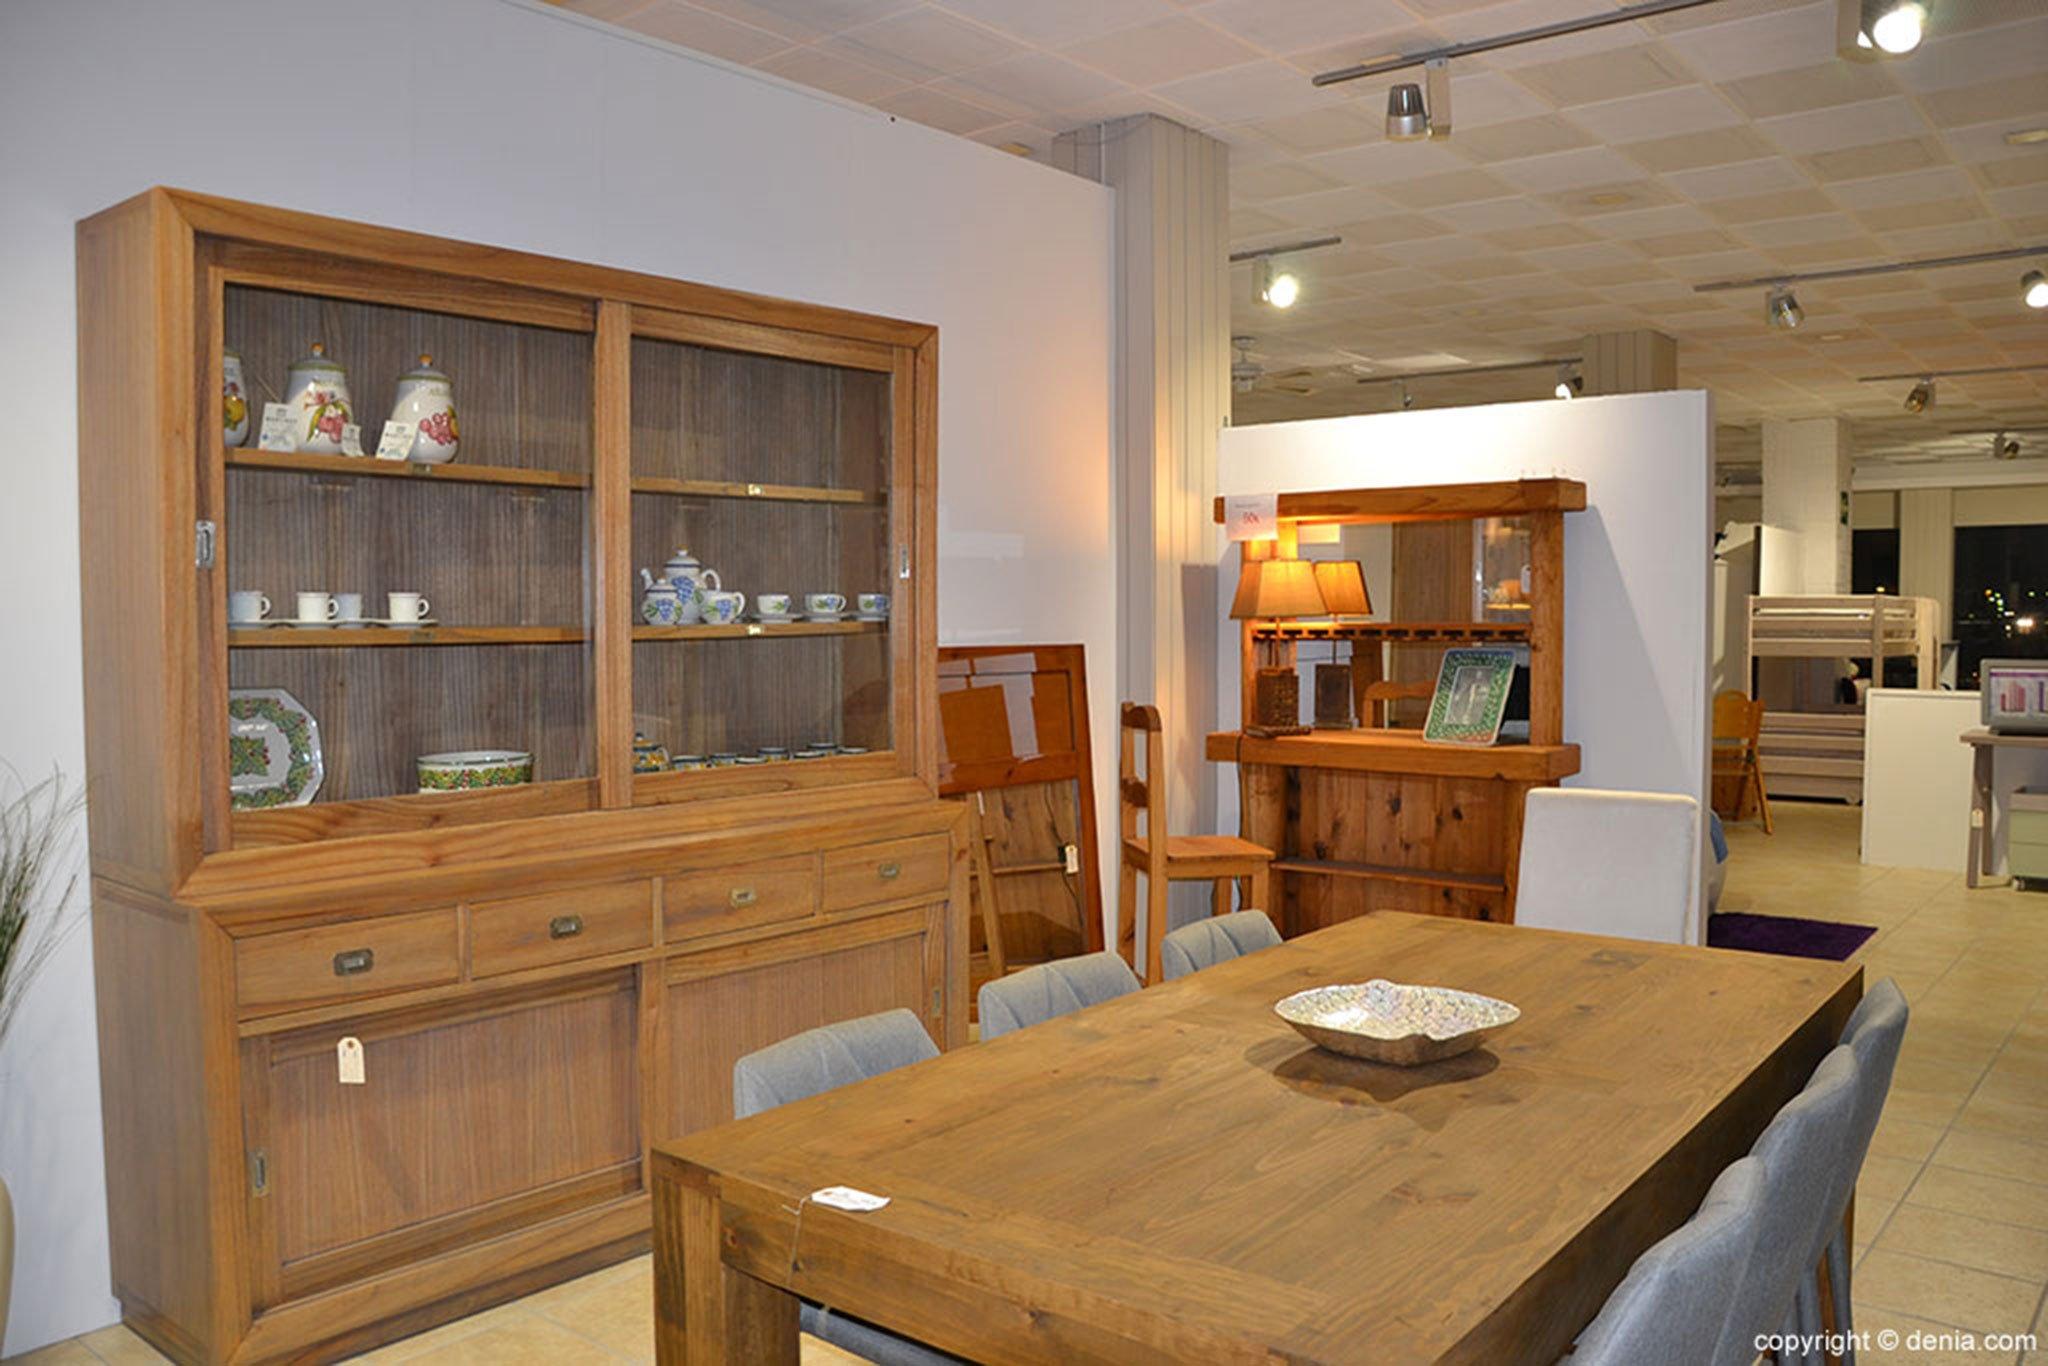 Comedor de madera – Muebles Martínez